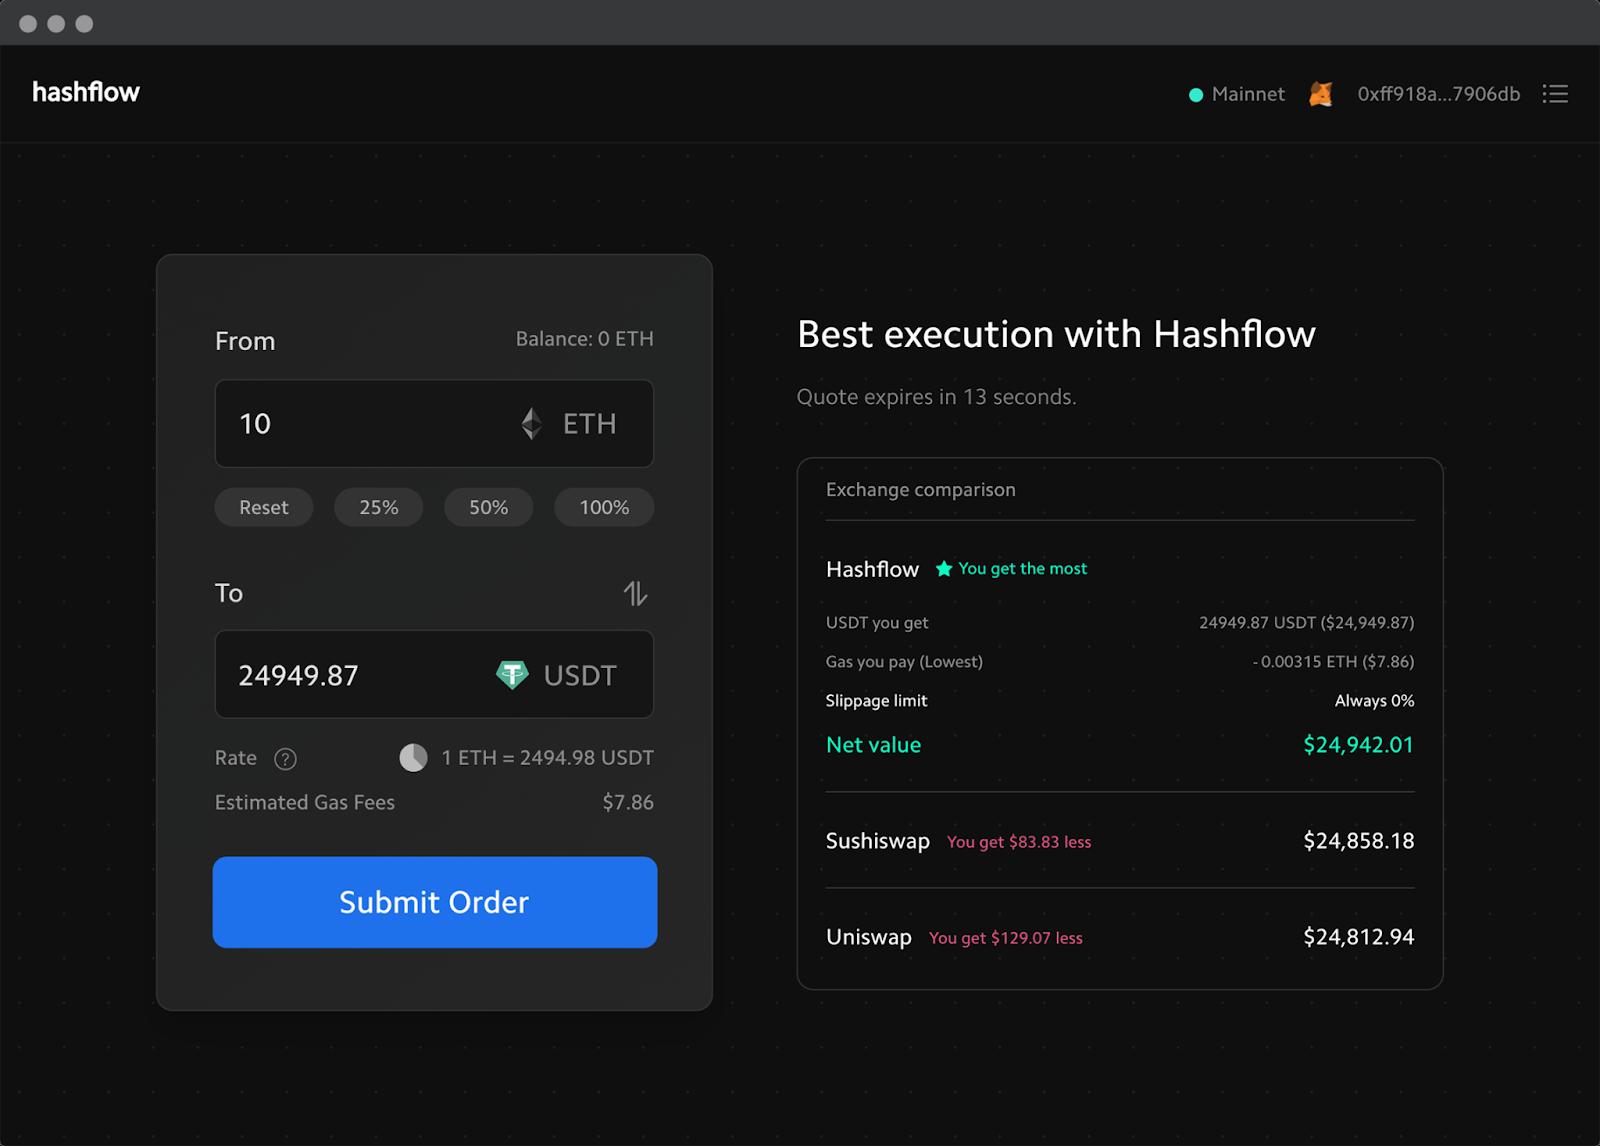 DeFi新玩法 | 3分钟了解DeFi专业做市商协议Hashflow